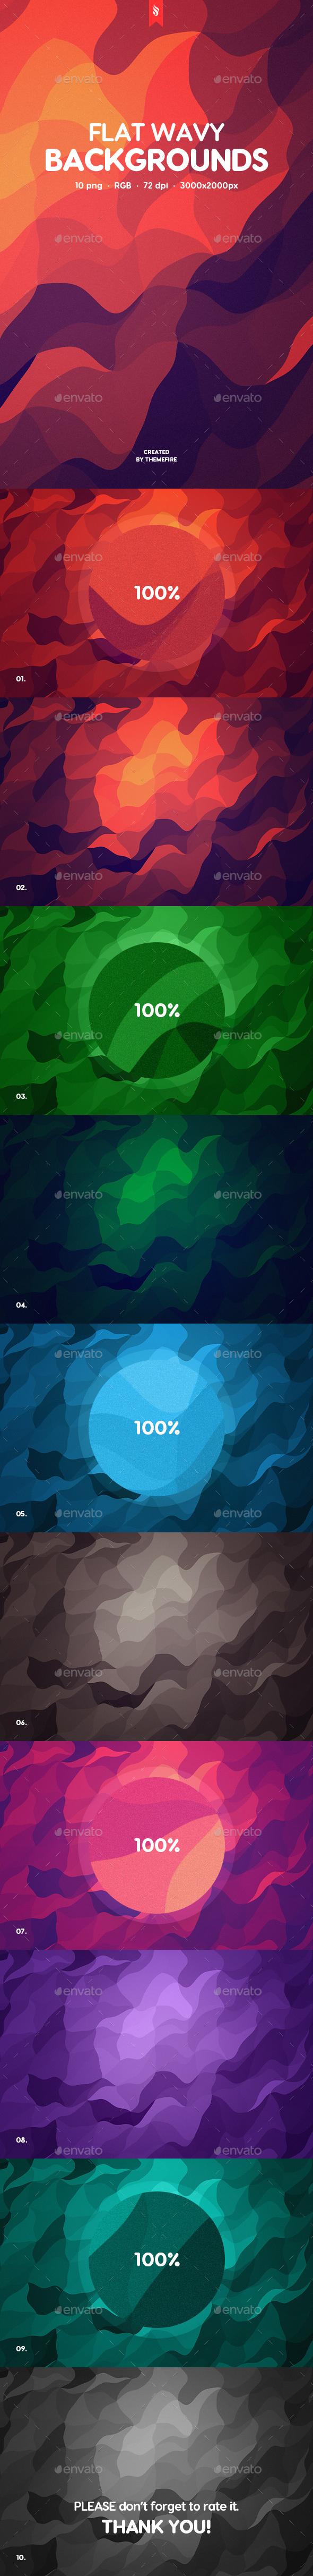 Flat Wavy Backgrounds - Patterns Backgrounds